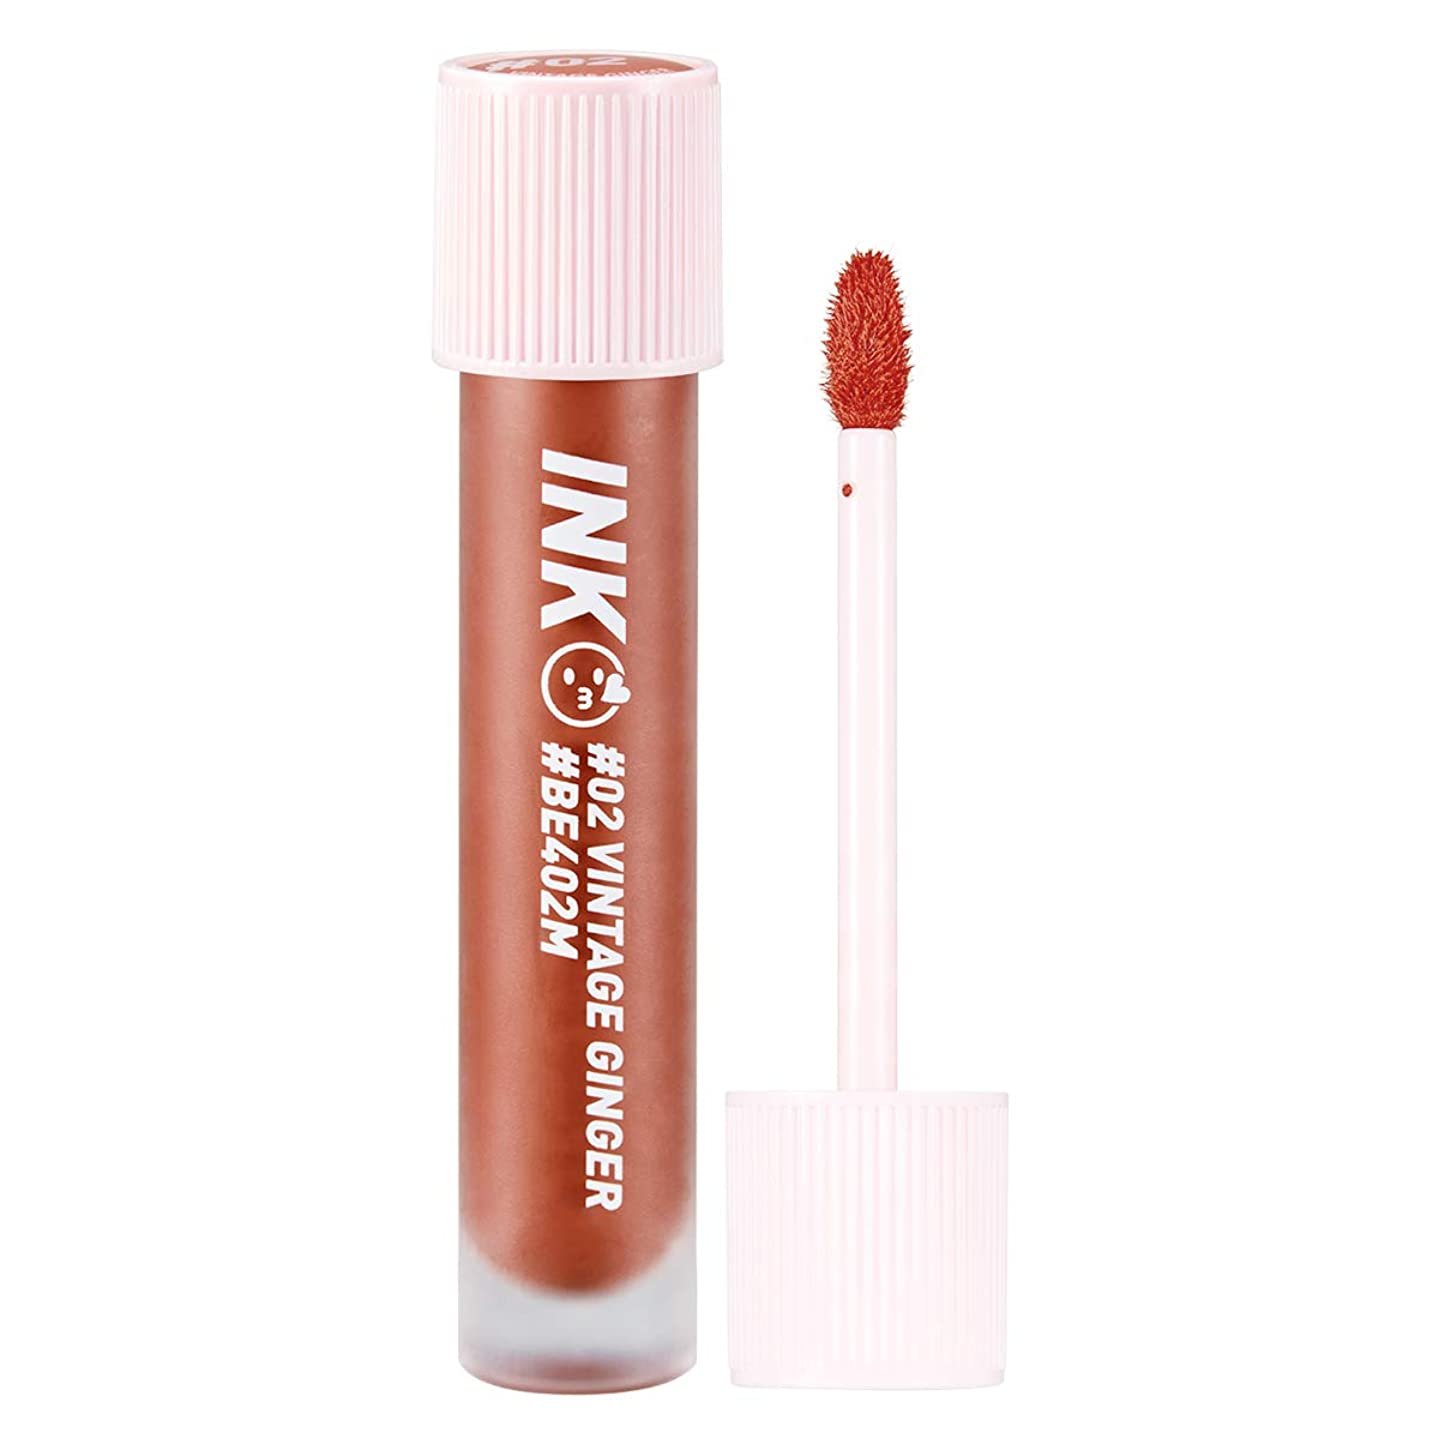 Peripera Ink Matte Blur Tint 0.13 Ounce 002 Vintage Ginger